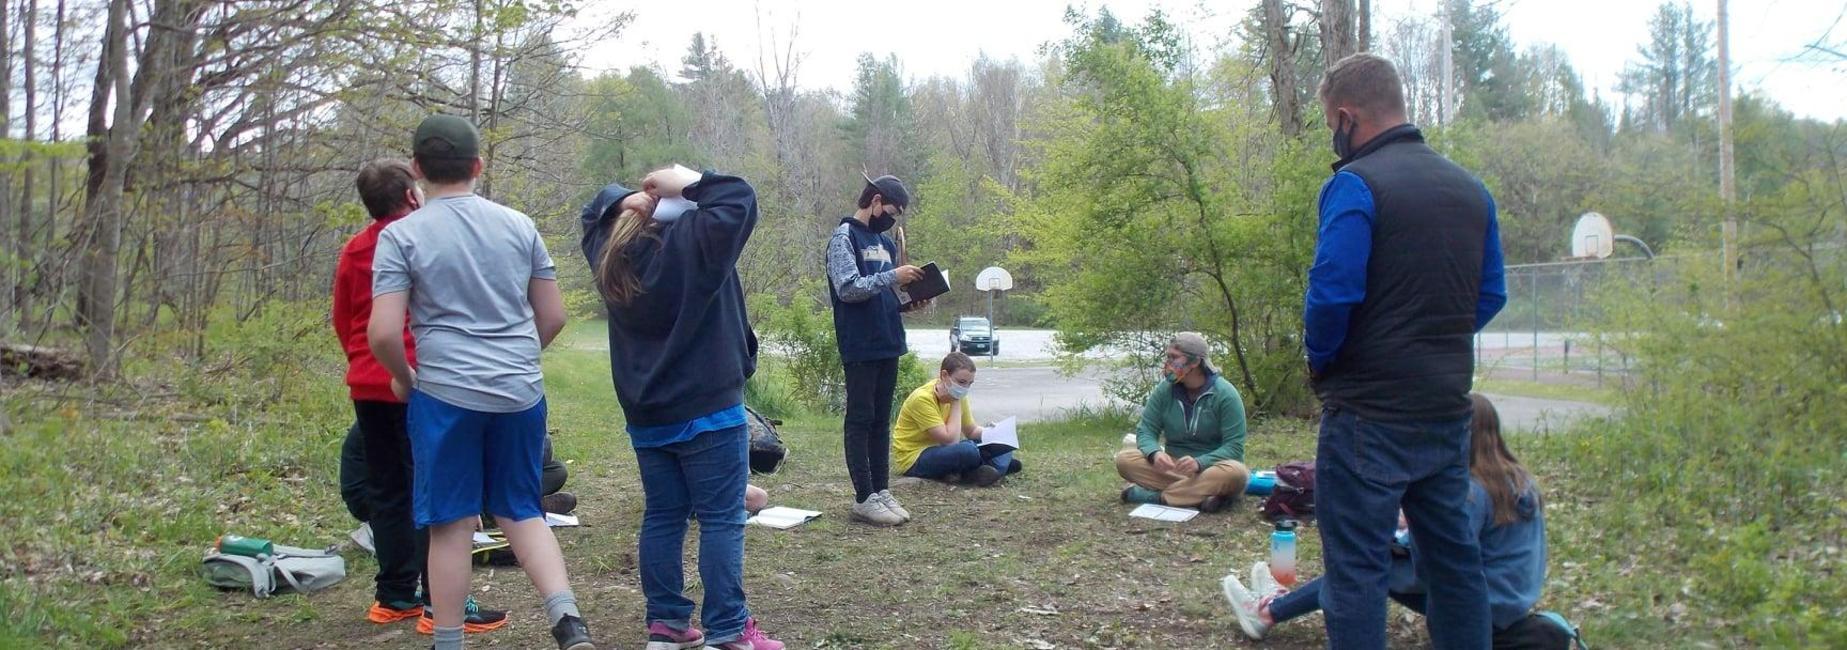 students learn outside